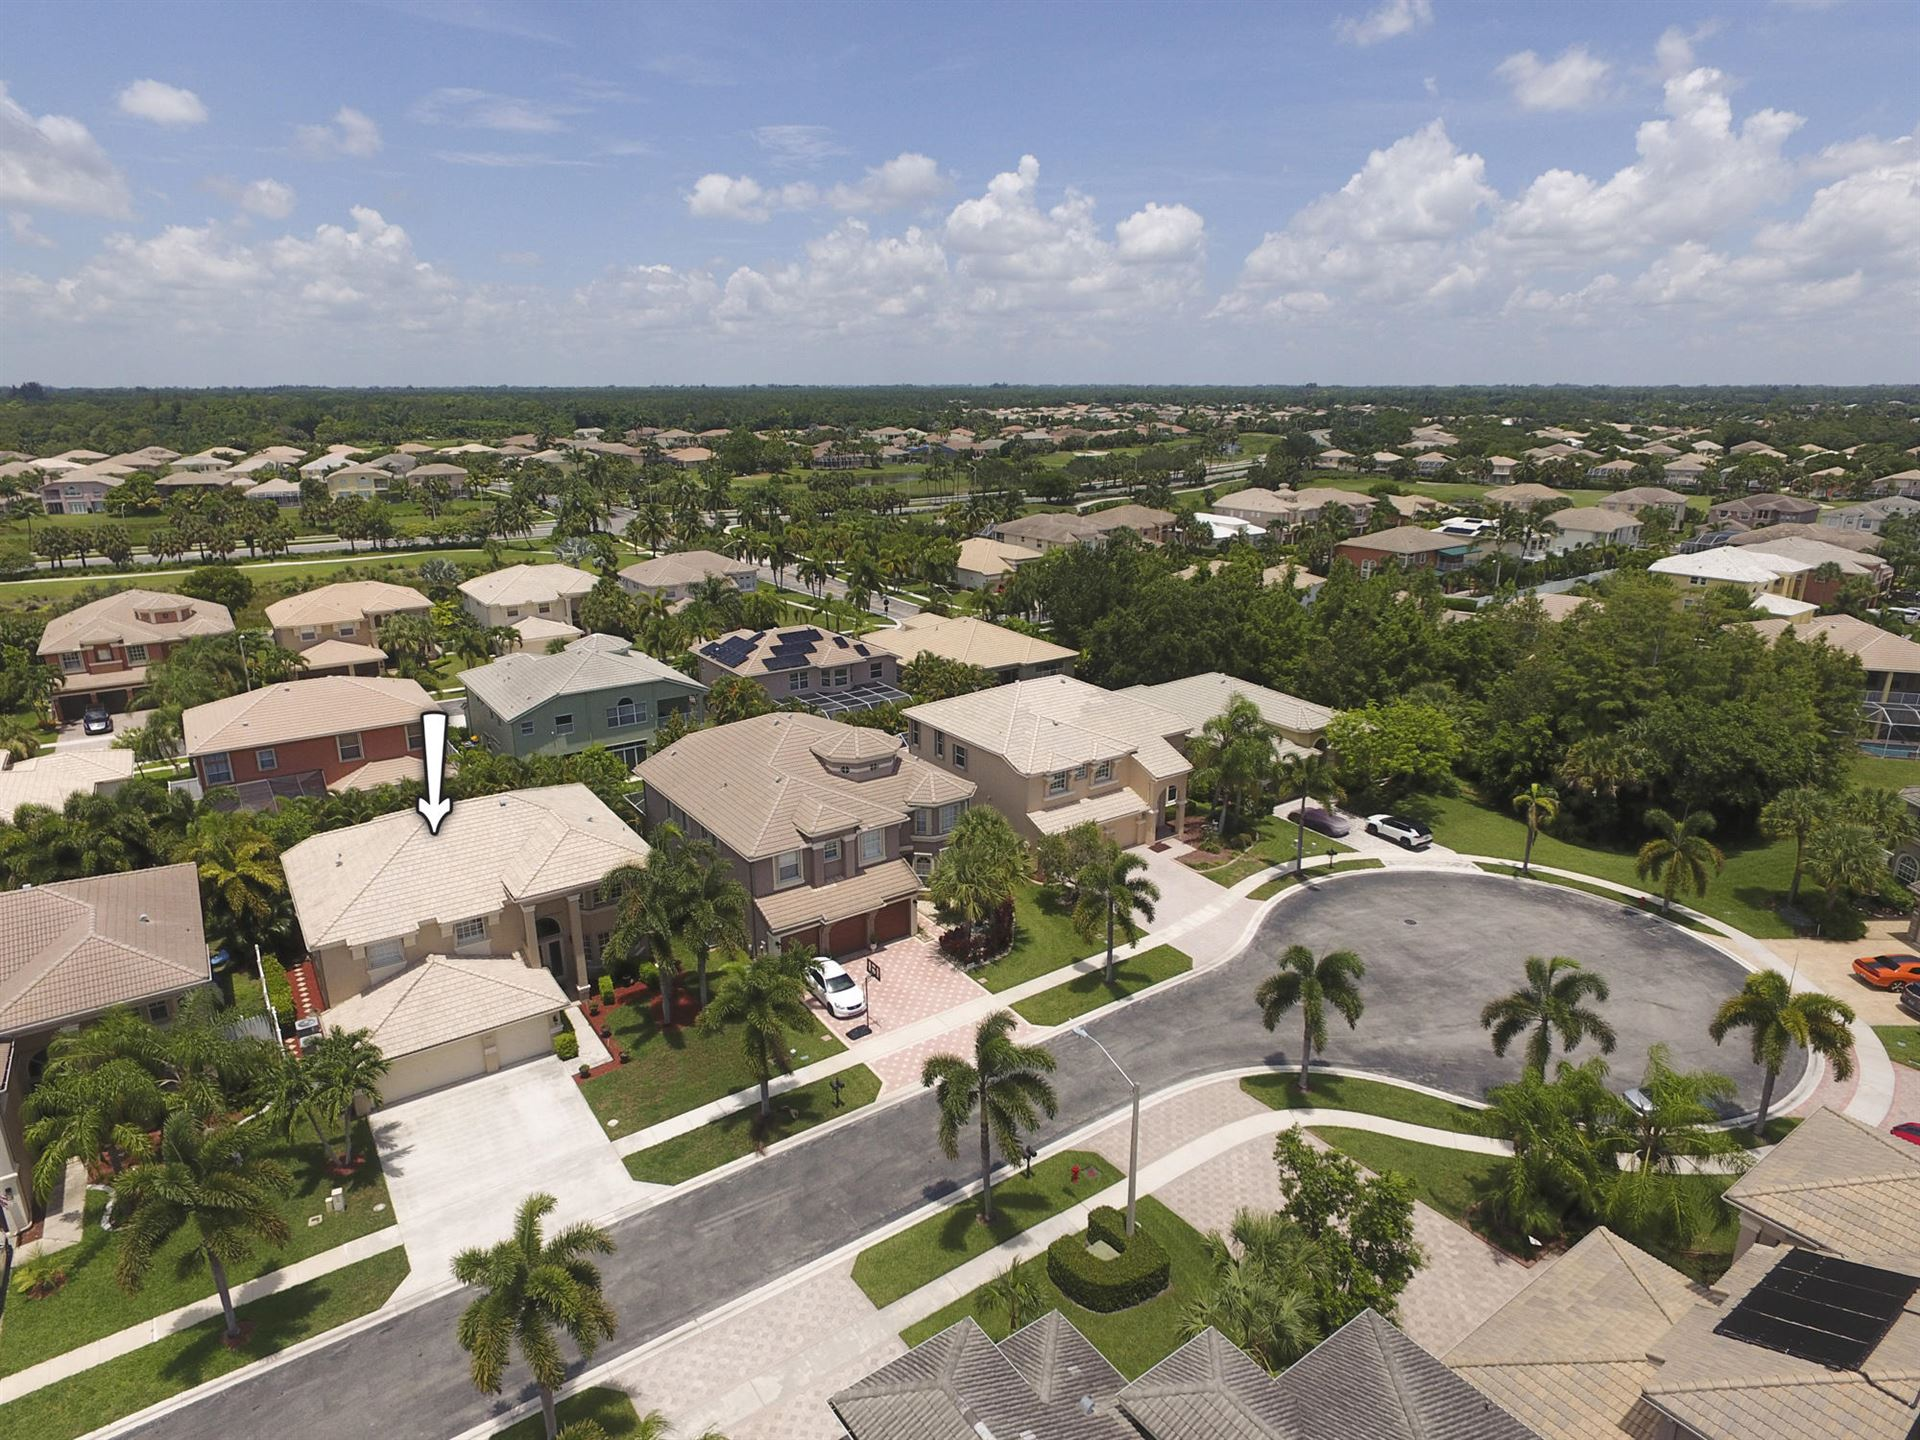 2107 Bellcrest Court, Royal Palm Beach, FL 33411 - #: RX-10638879